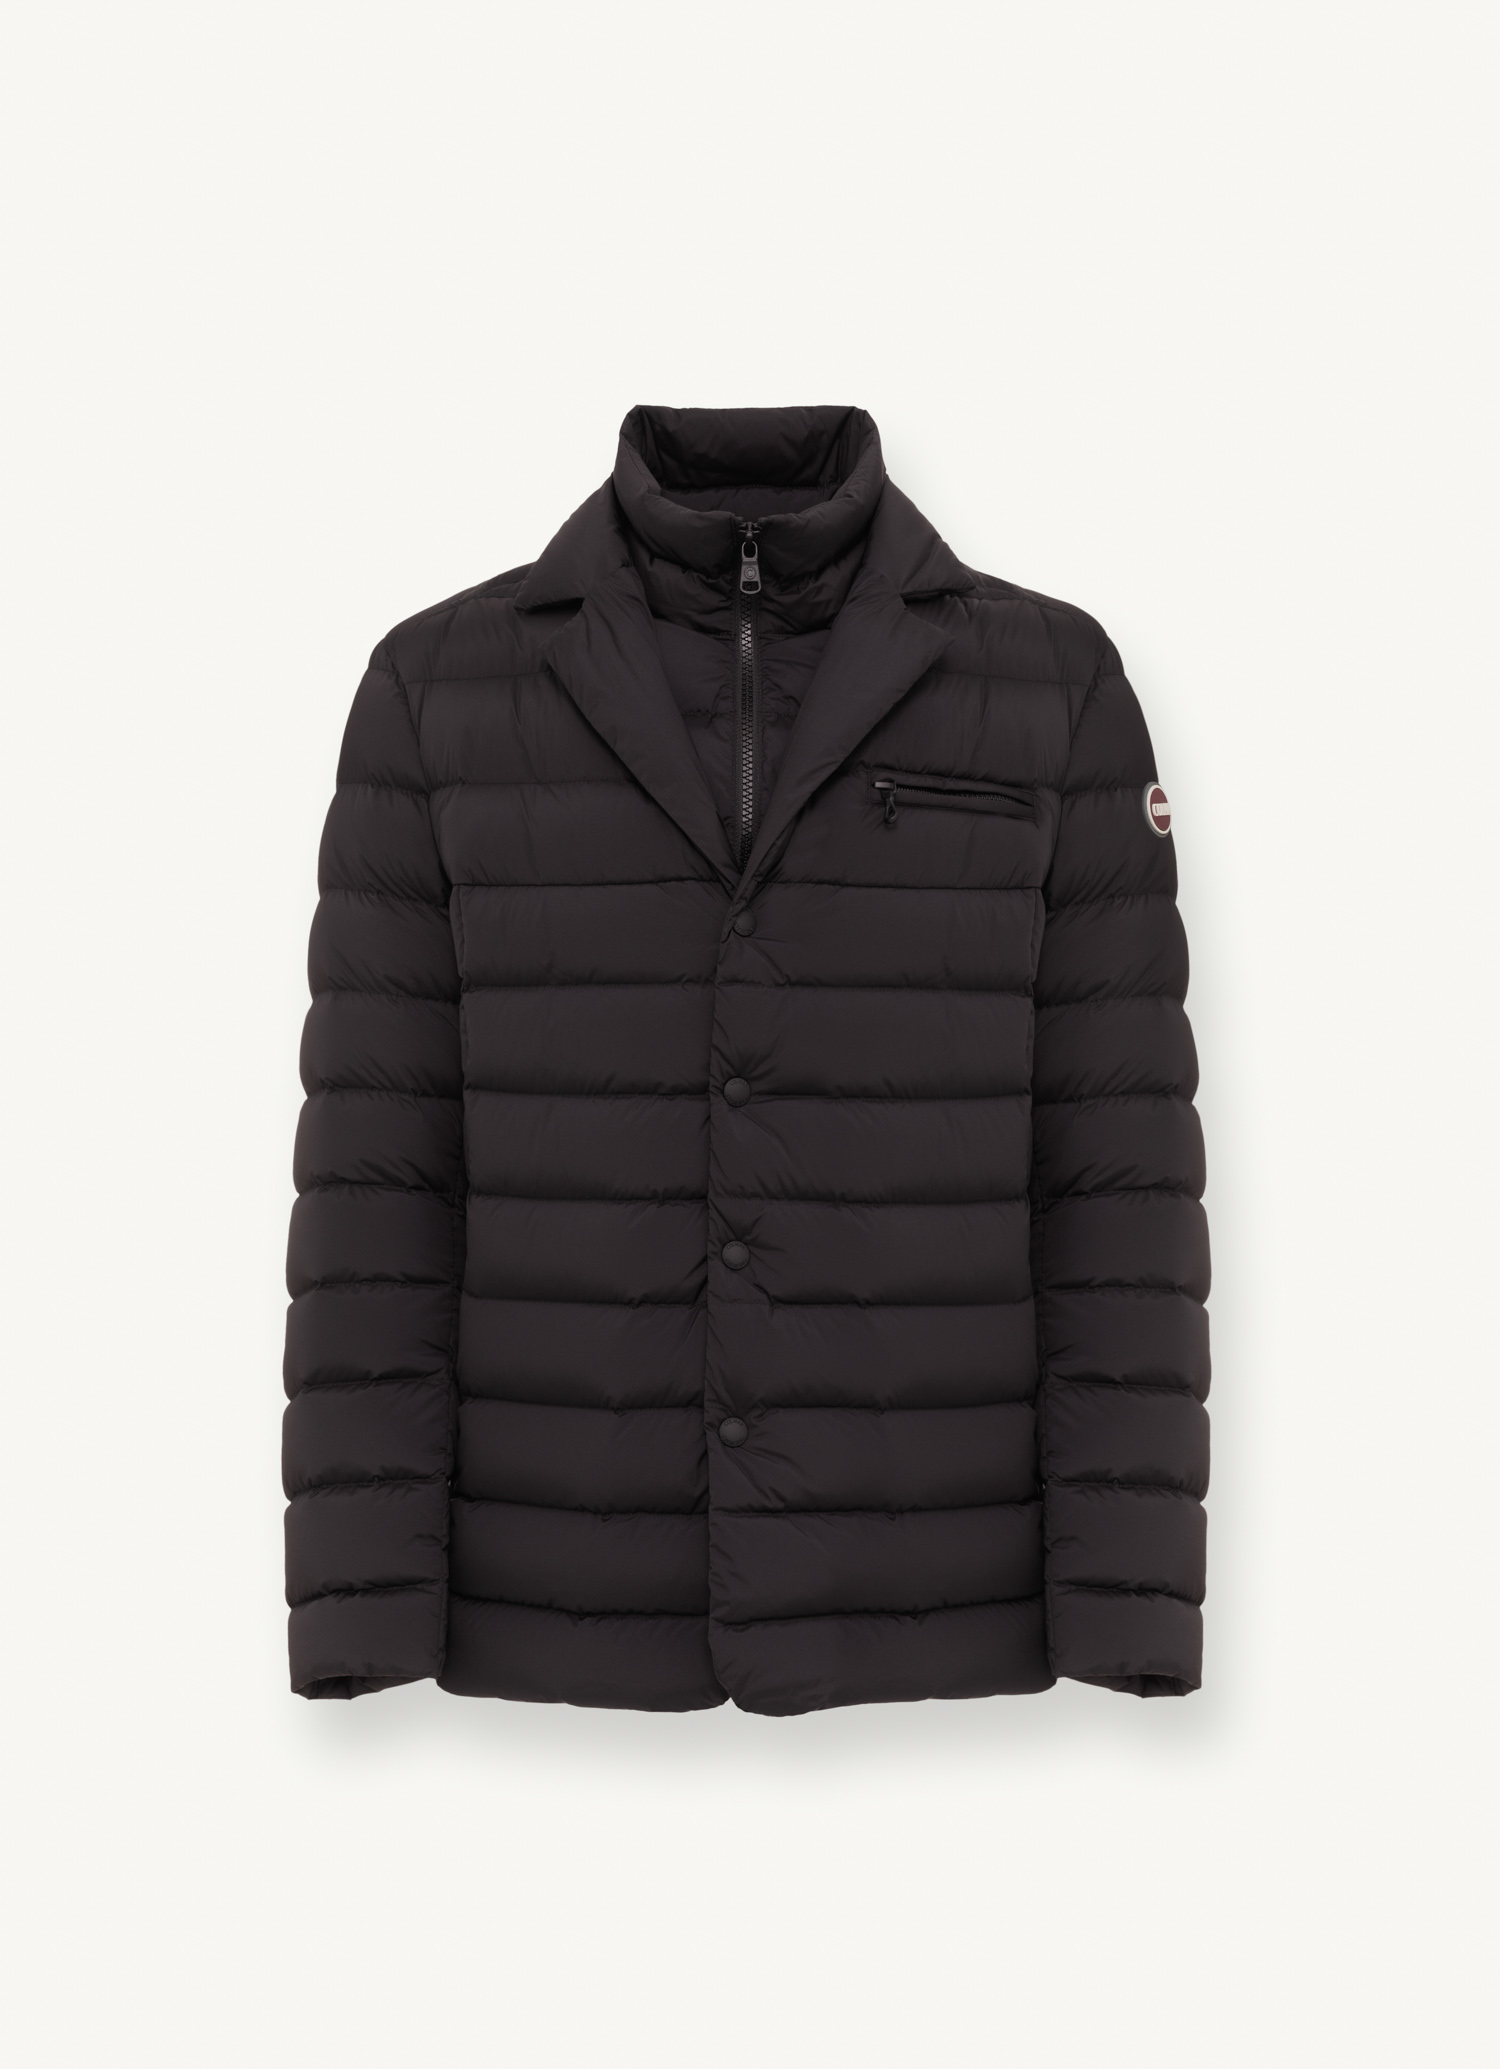 Goose down waterproof jacket COLMAR | Jackets | 1230 2SE99